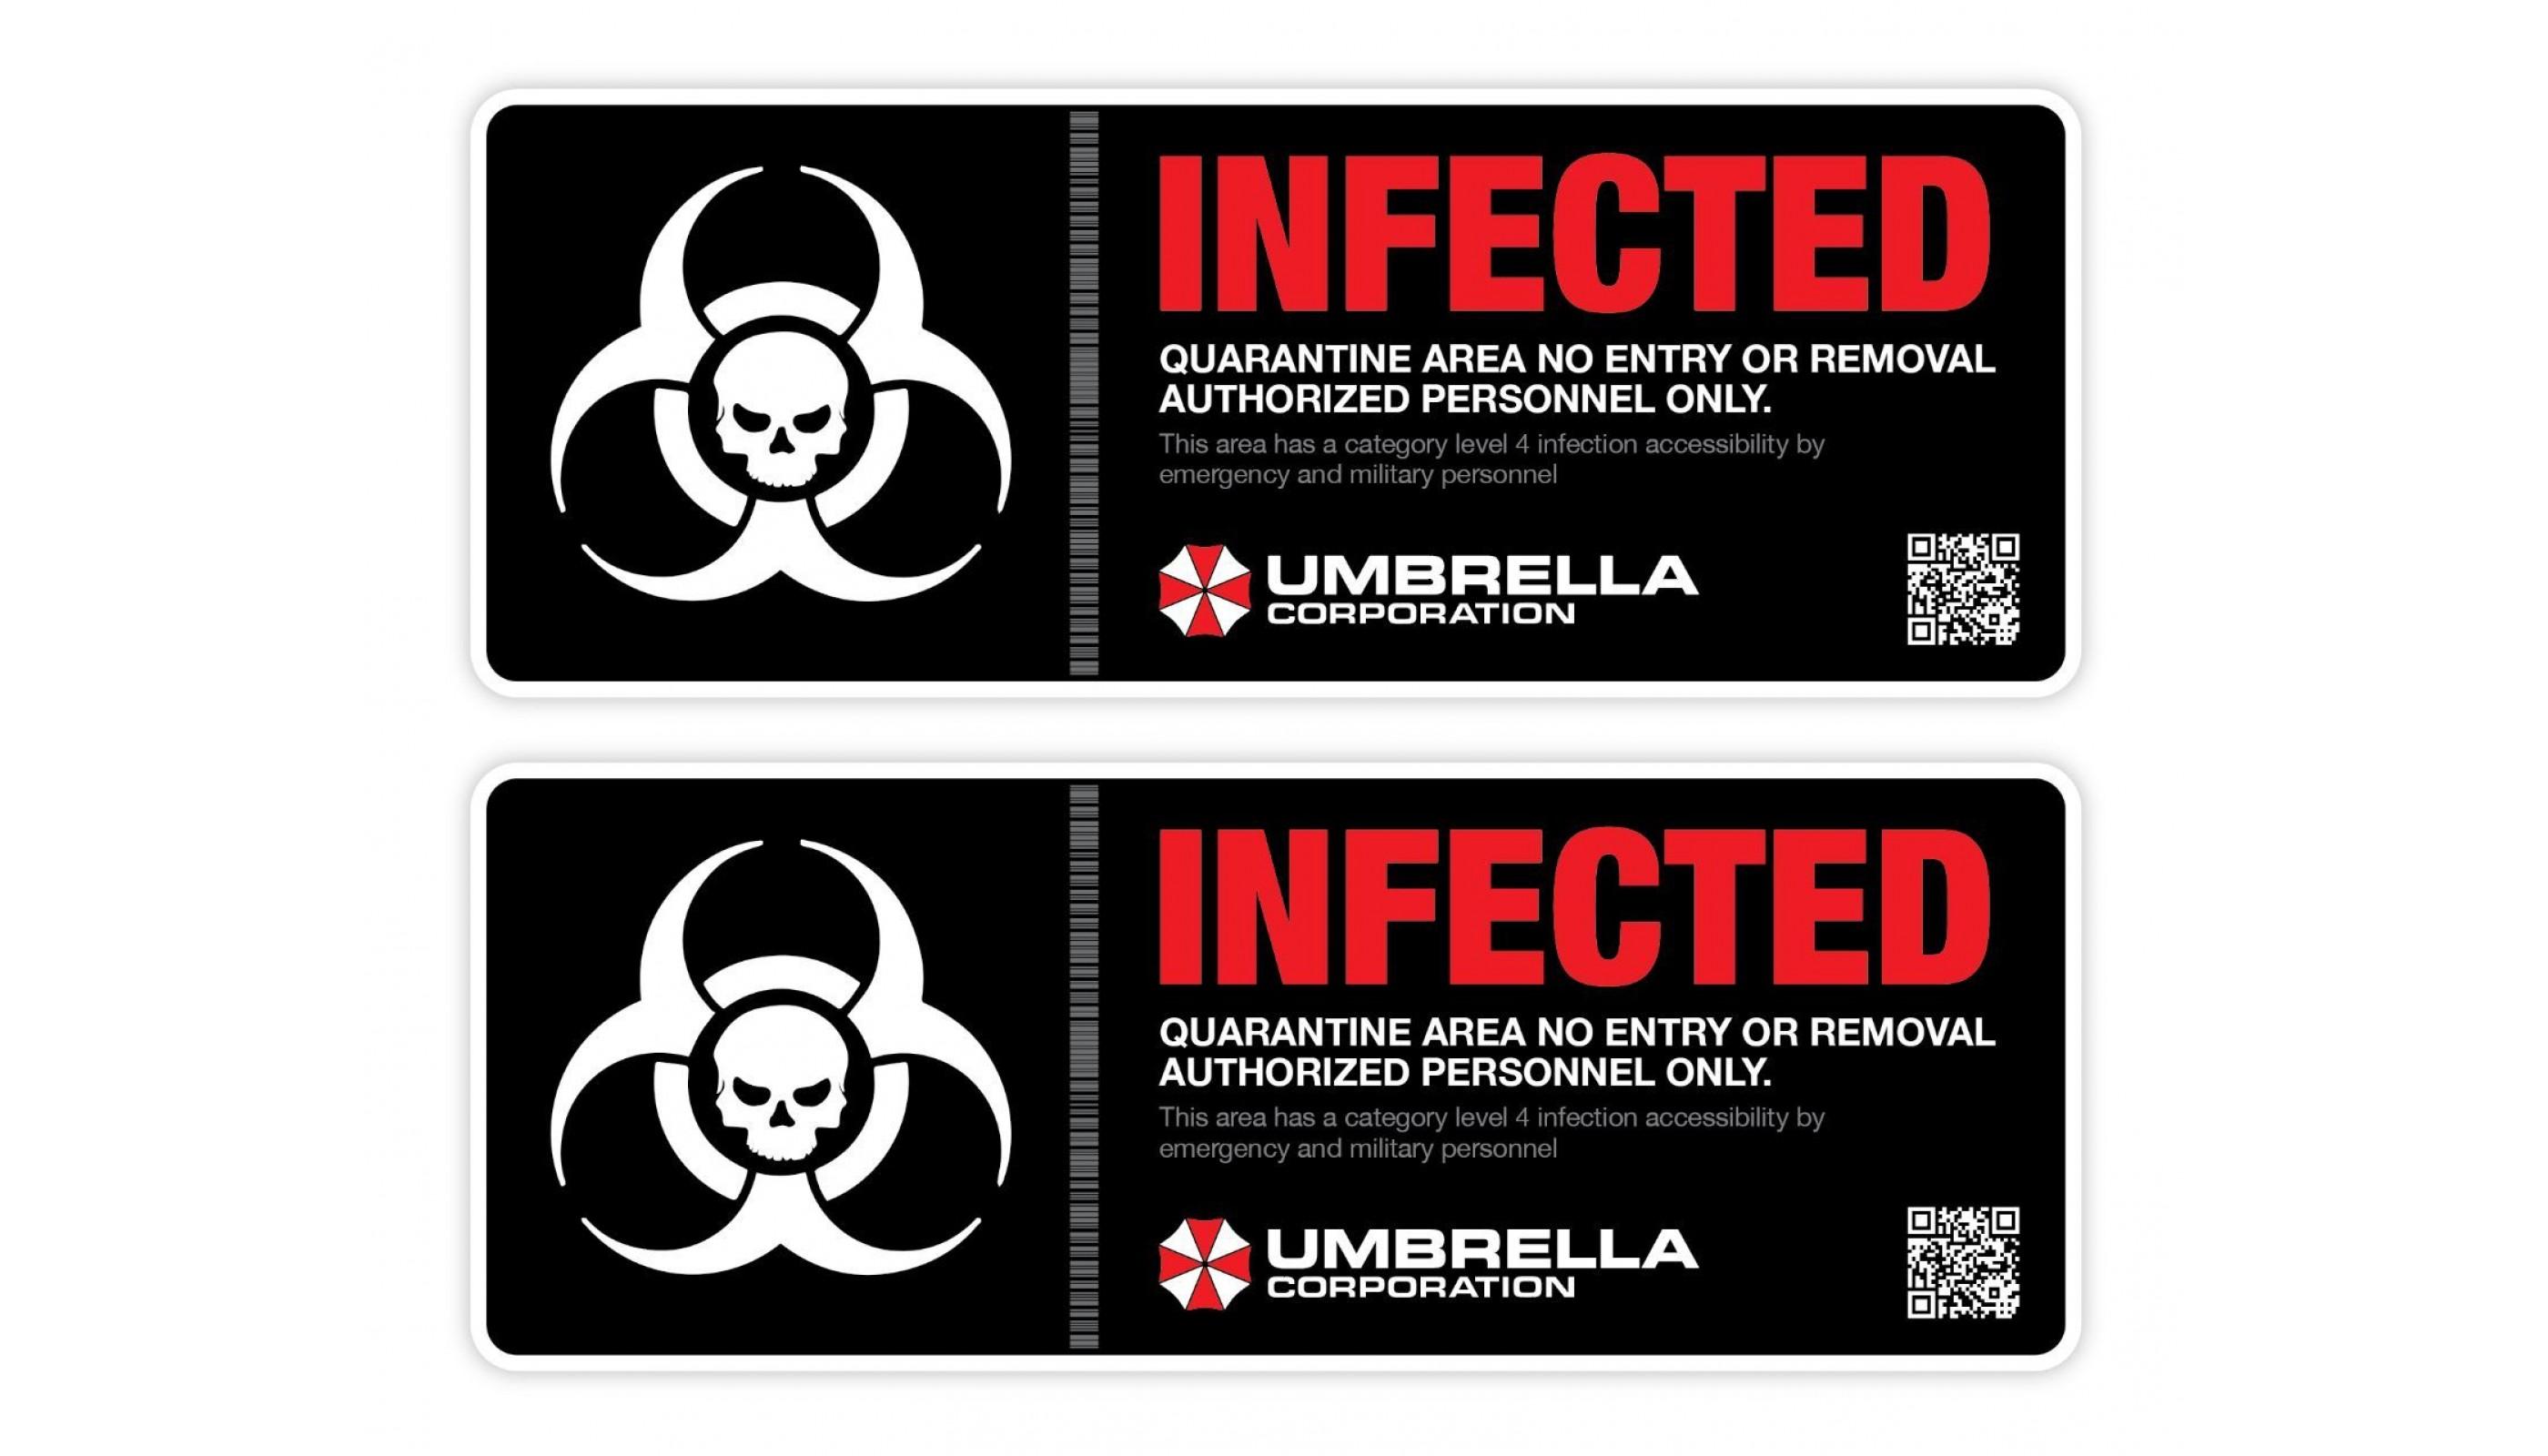 Umbrella Corp Resident Evil Infected Biohazardl Vinyl Sticker